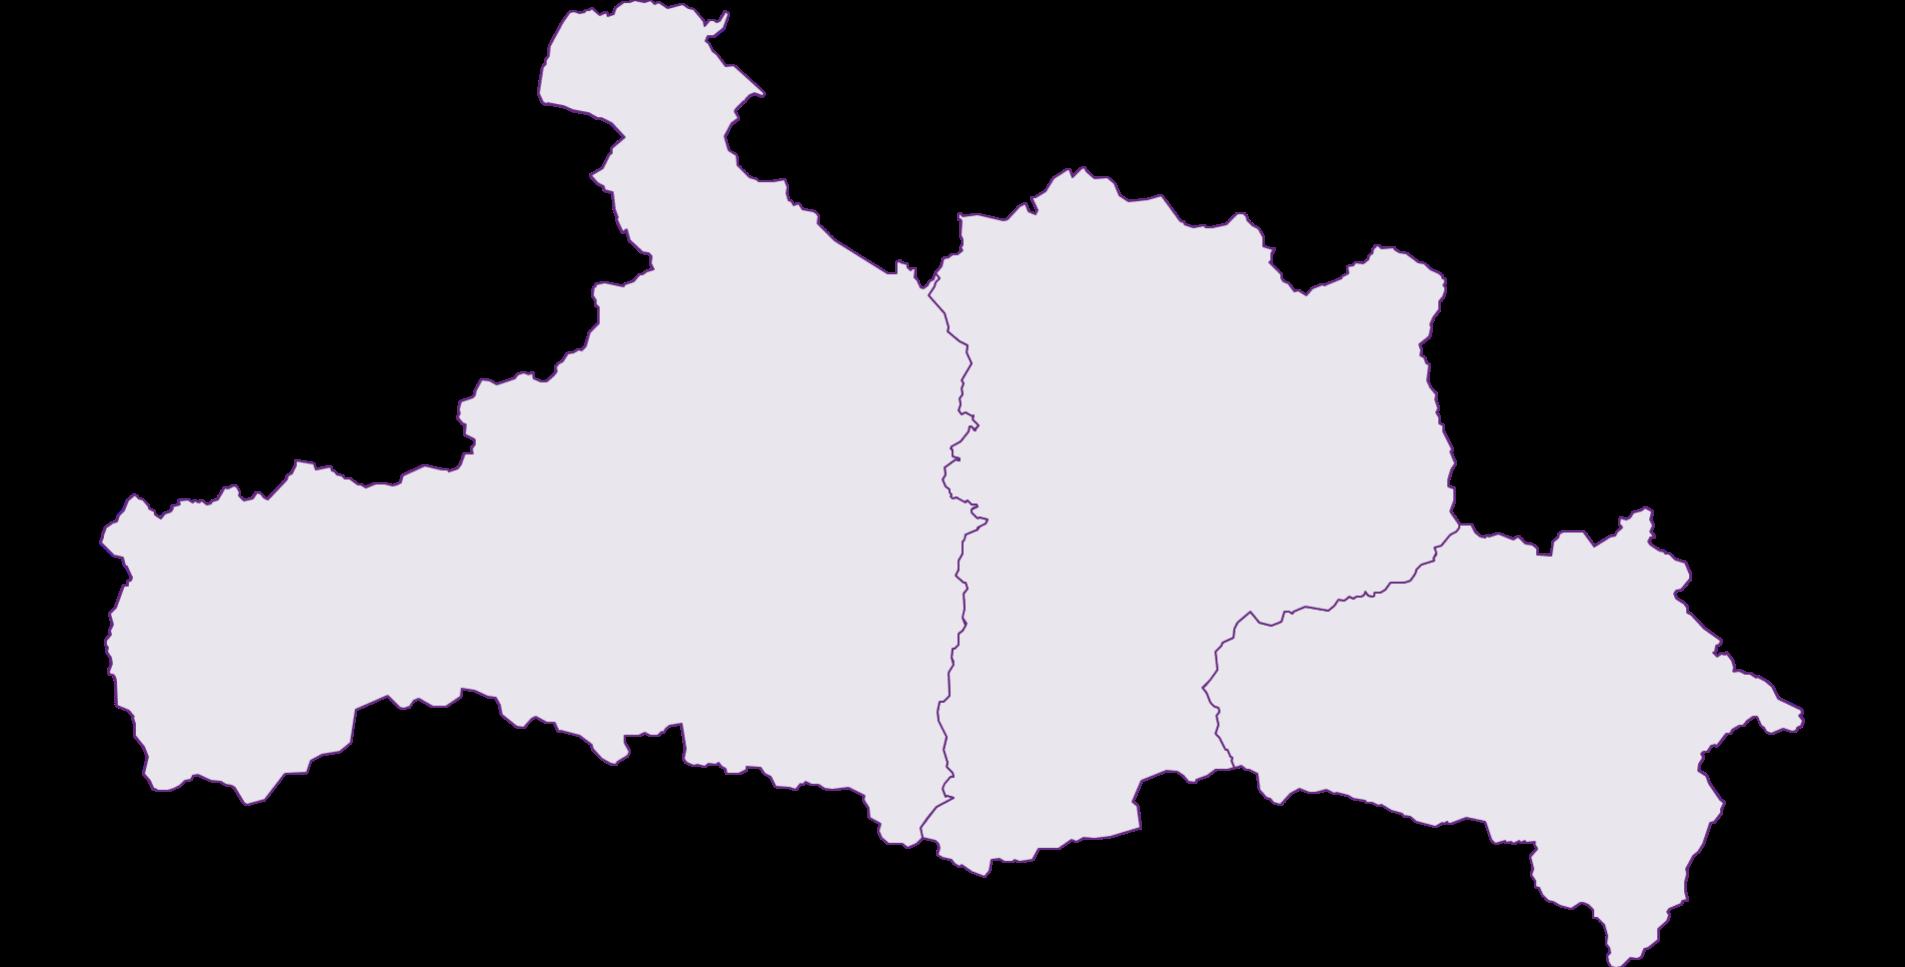 Lungau/Pinzgau/Pongau